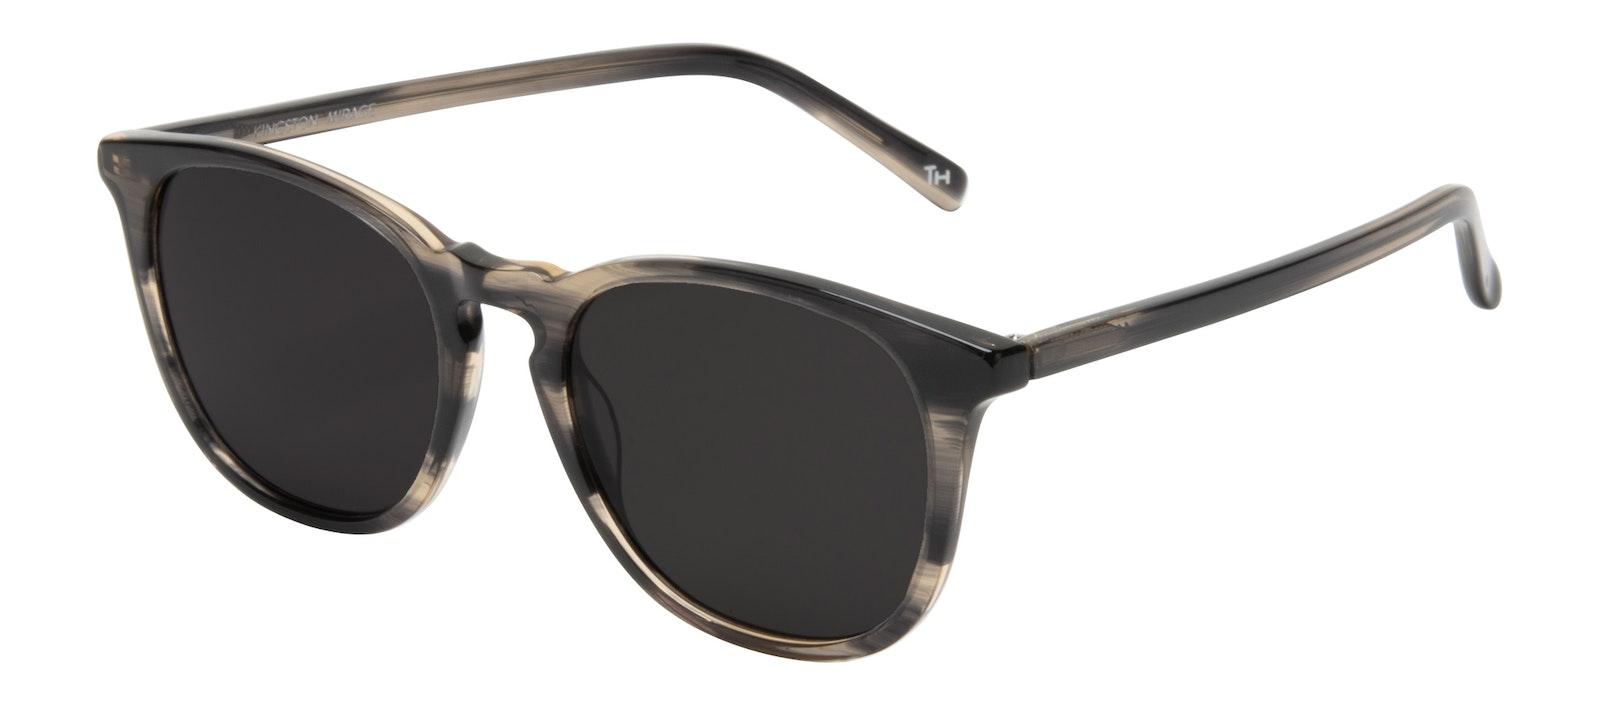 Affordable Fashion Glasses Round Sunglasses Men Kingston Mirage Tilt